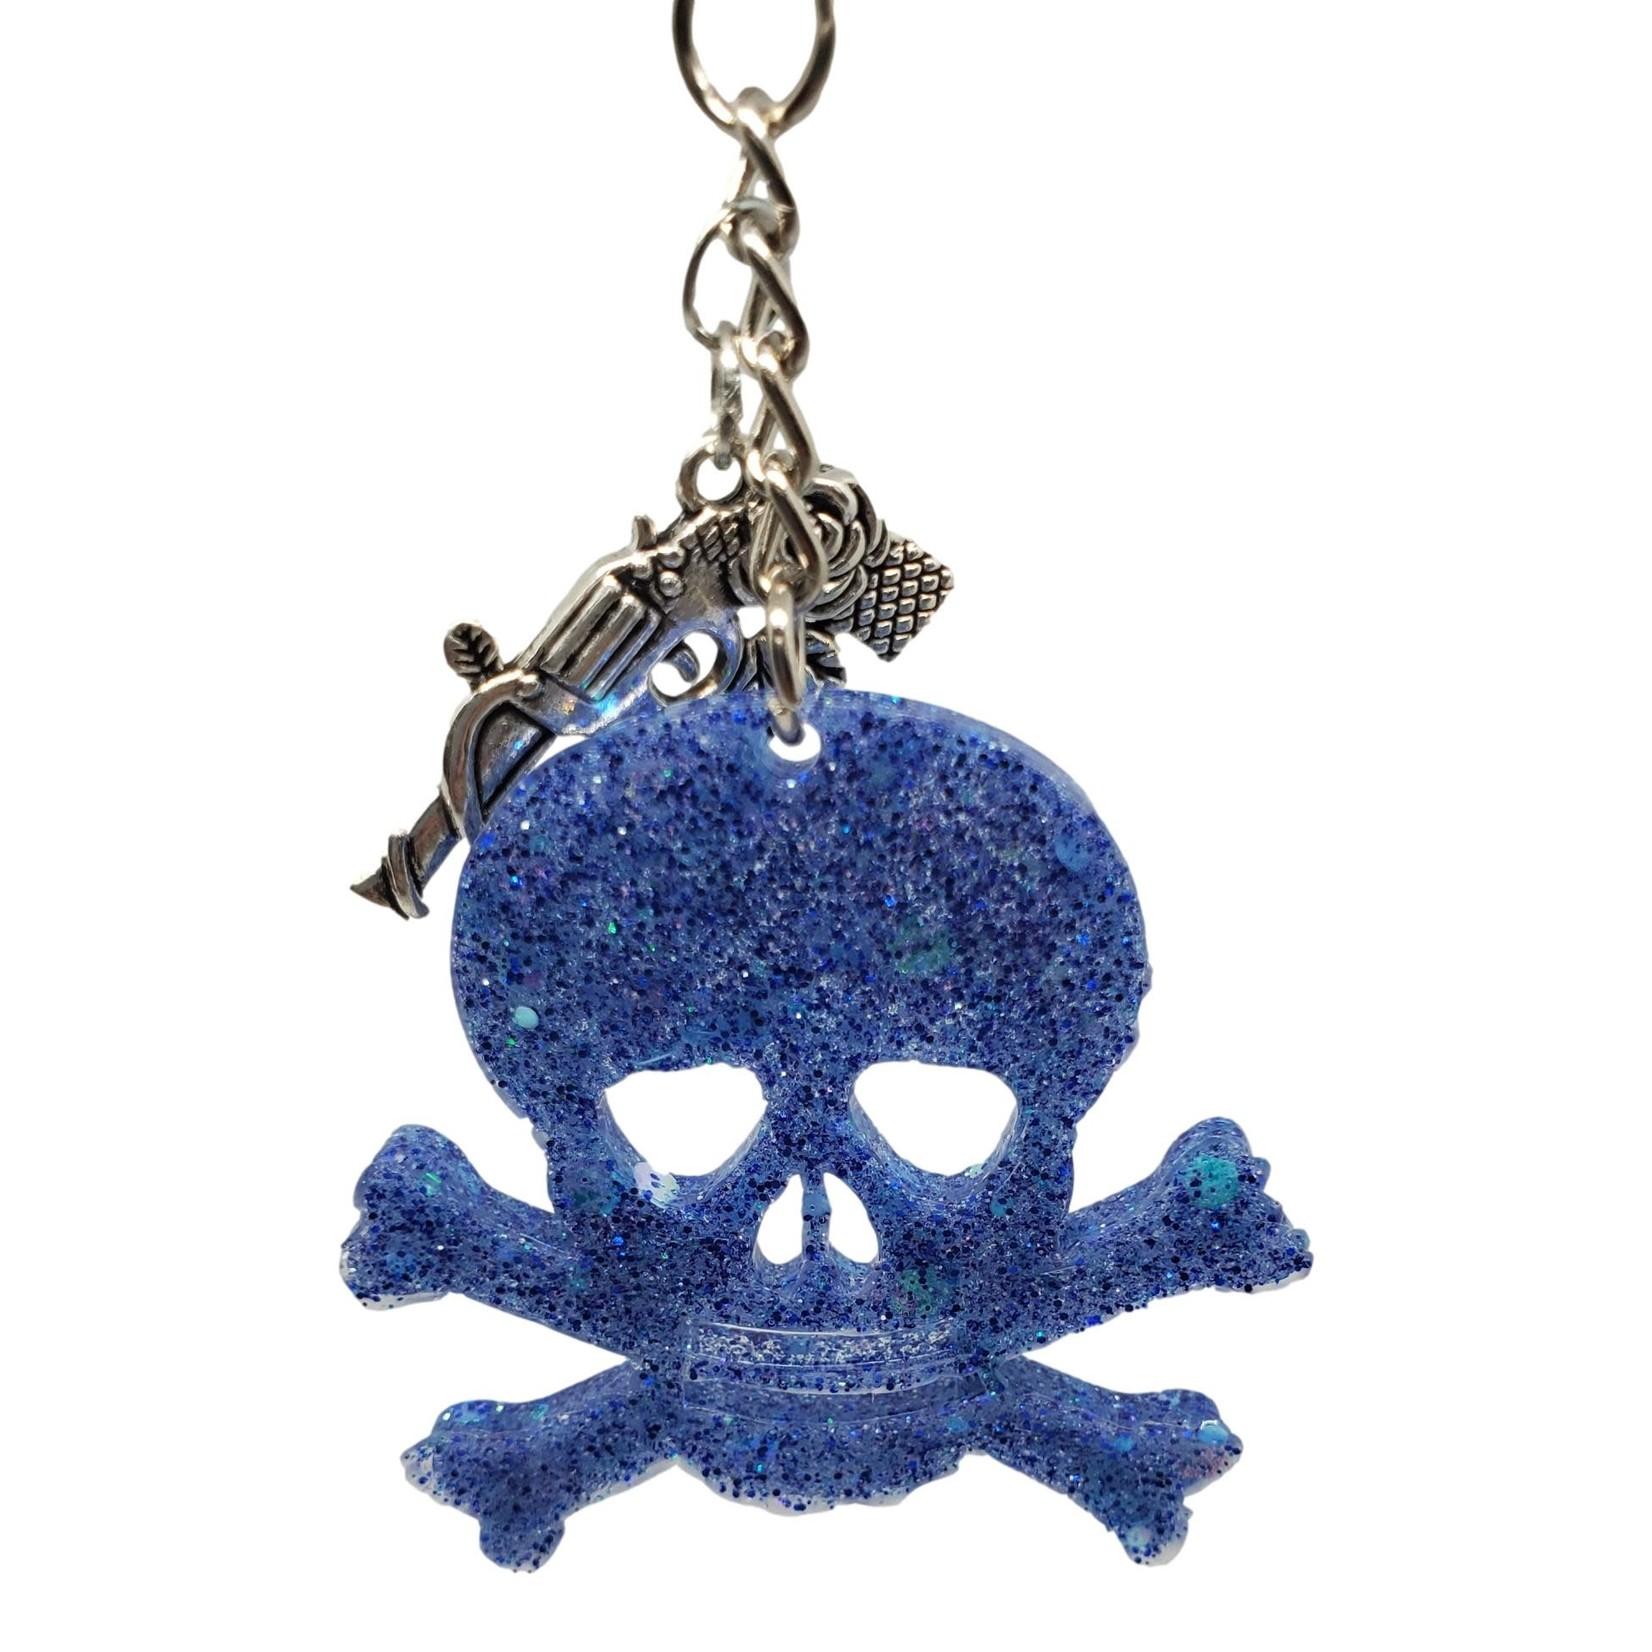 East Coast Sirens Blue Iridescent Glitter Skull & Crossbones Key Chain